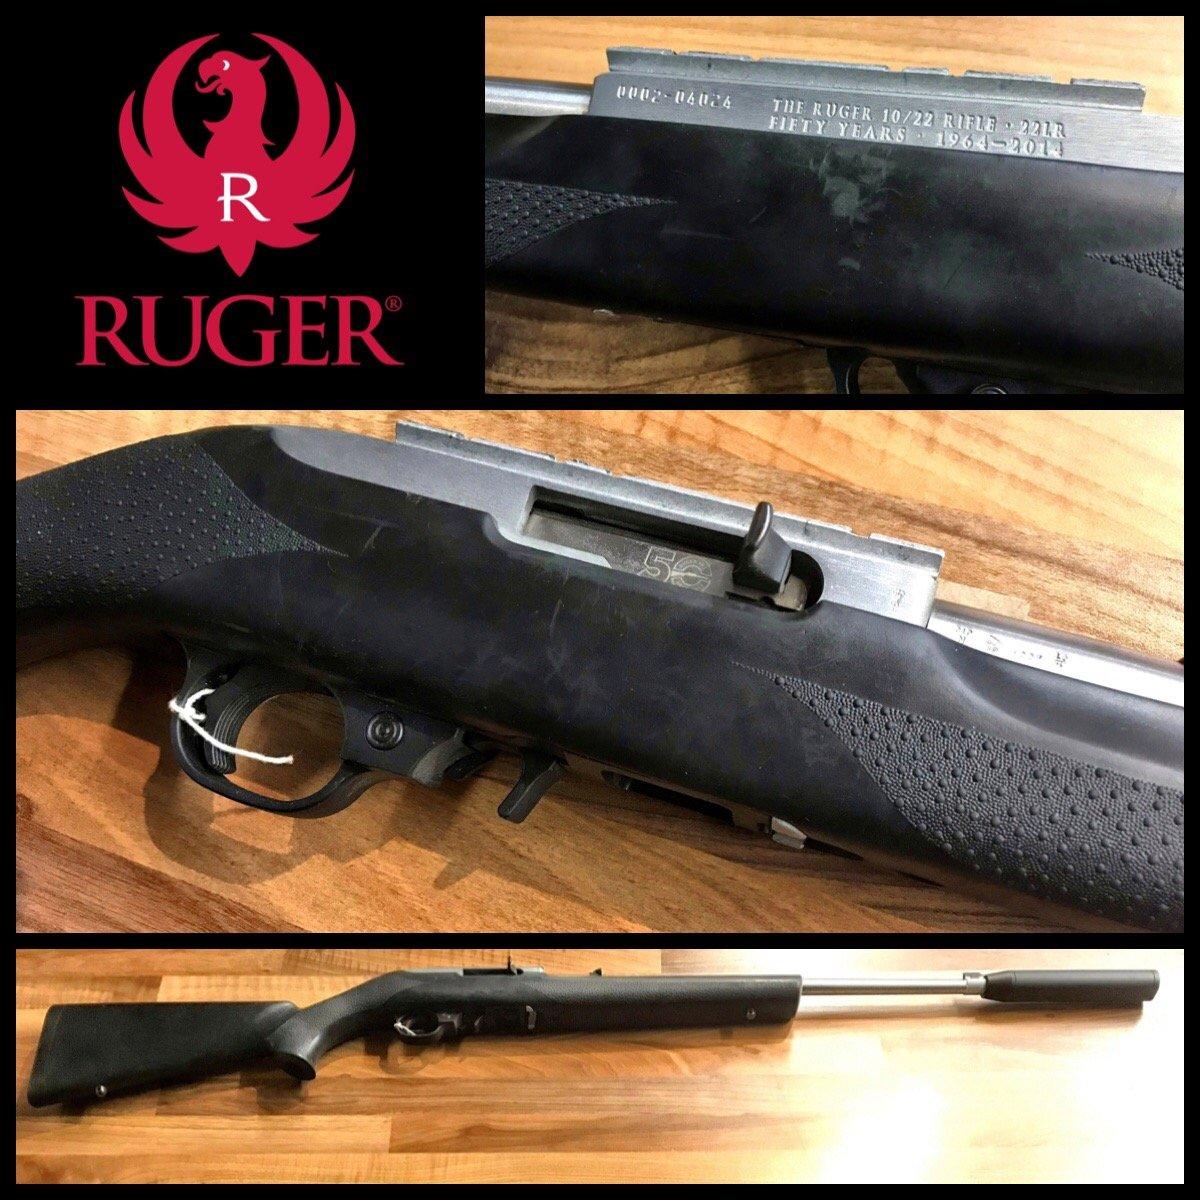 Used rifles